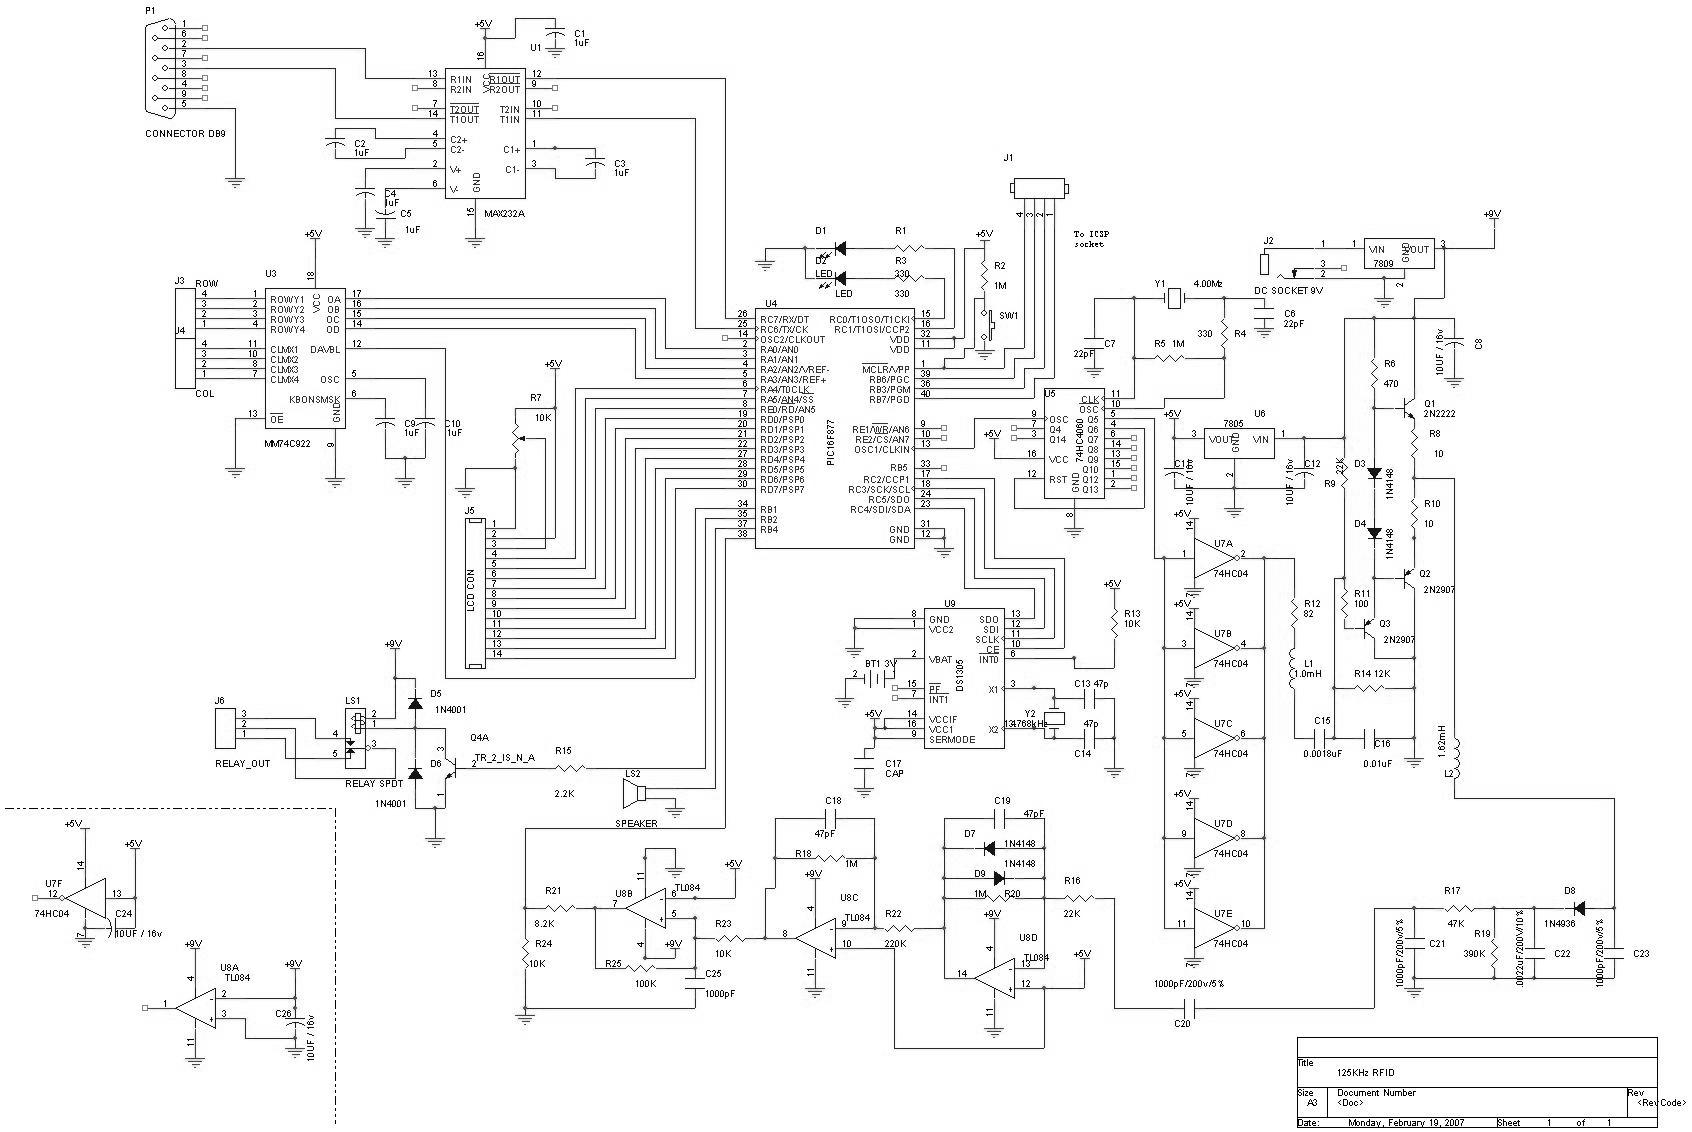 House Board Wiring Diagram